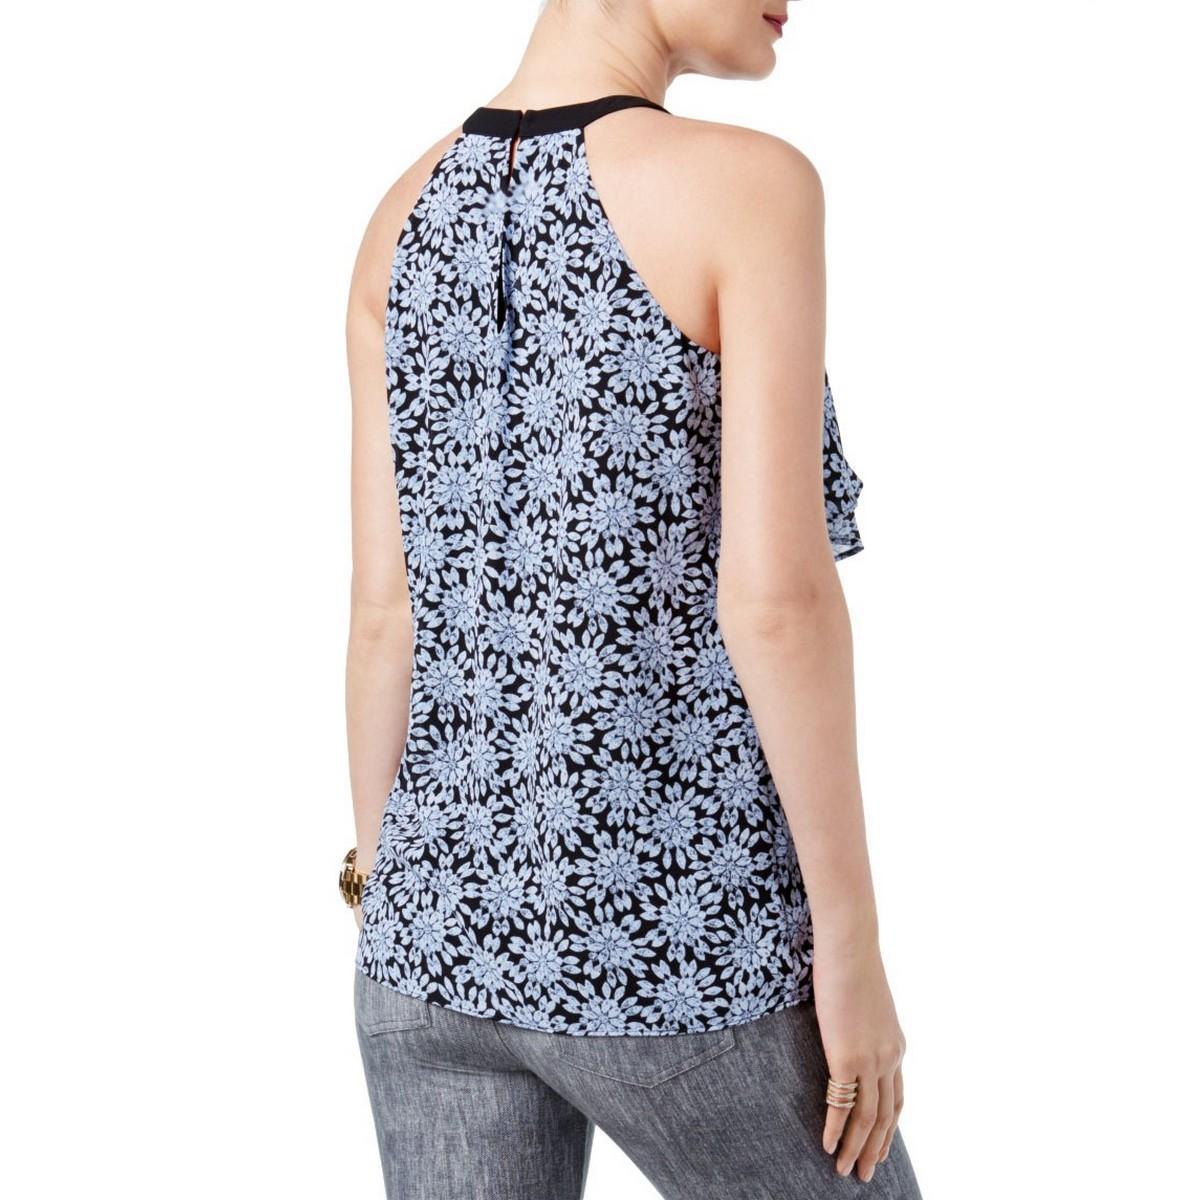 MICHAEL-KORS-Women-039-s-Black-Ruffled-Printed-Flounce-Halter-Blouse-Shirt-Top-TEDO thumbnail 4